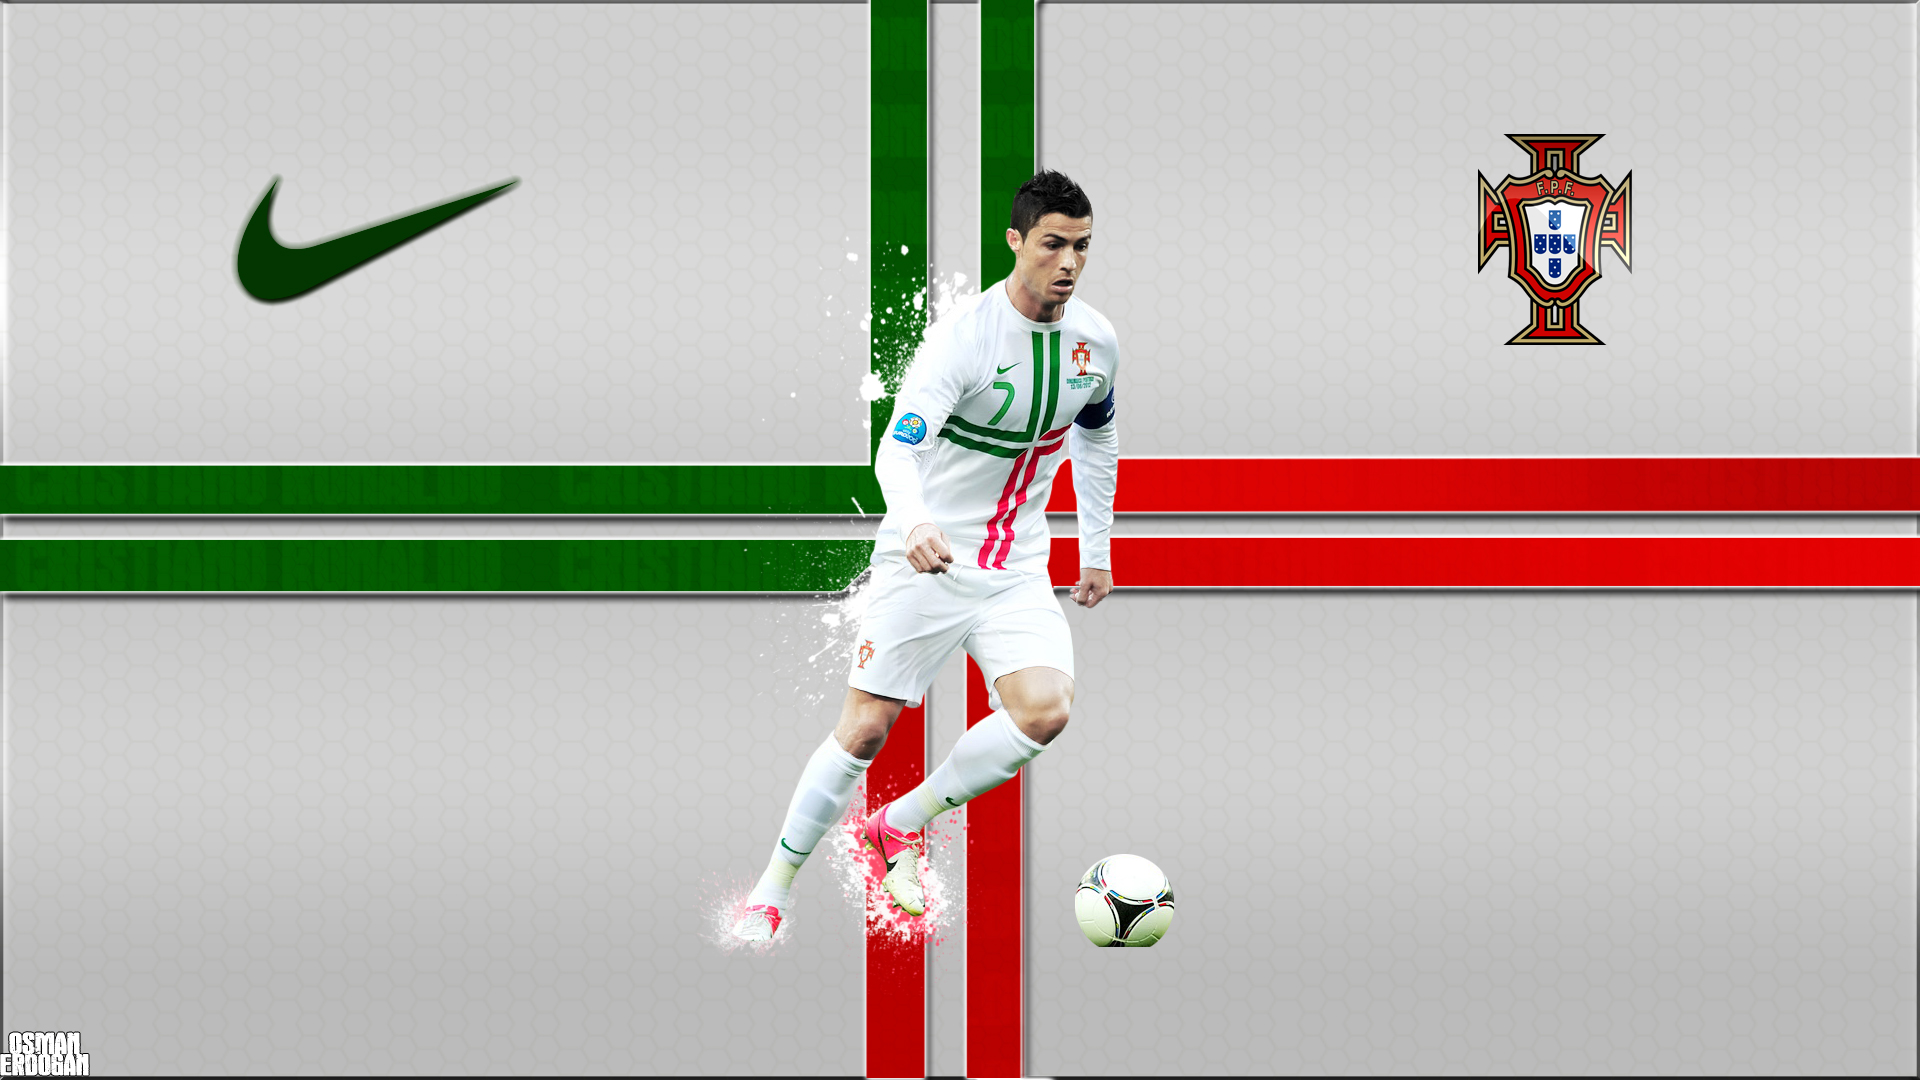 Cristiano Ronaldo Portugal Wallpaper by OsmanErdogan on 1920x1080